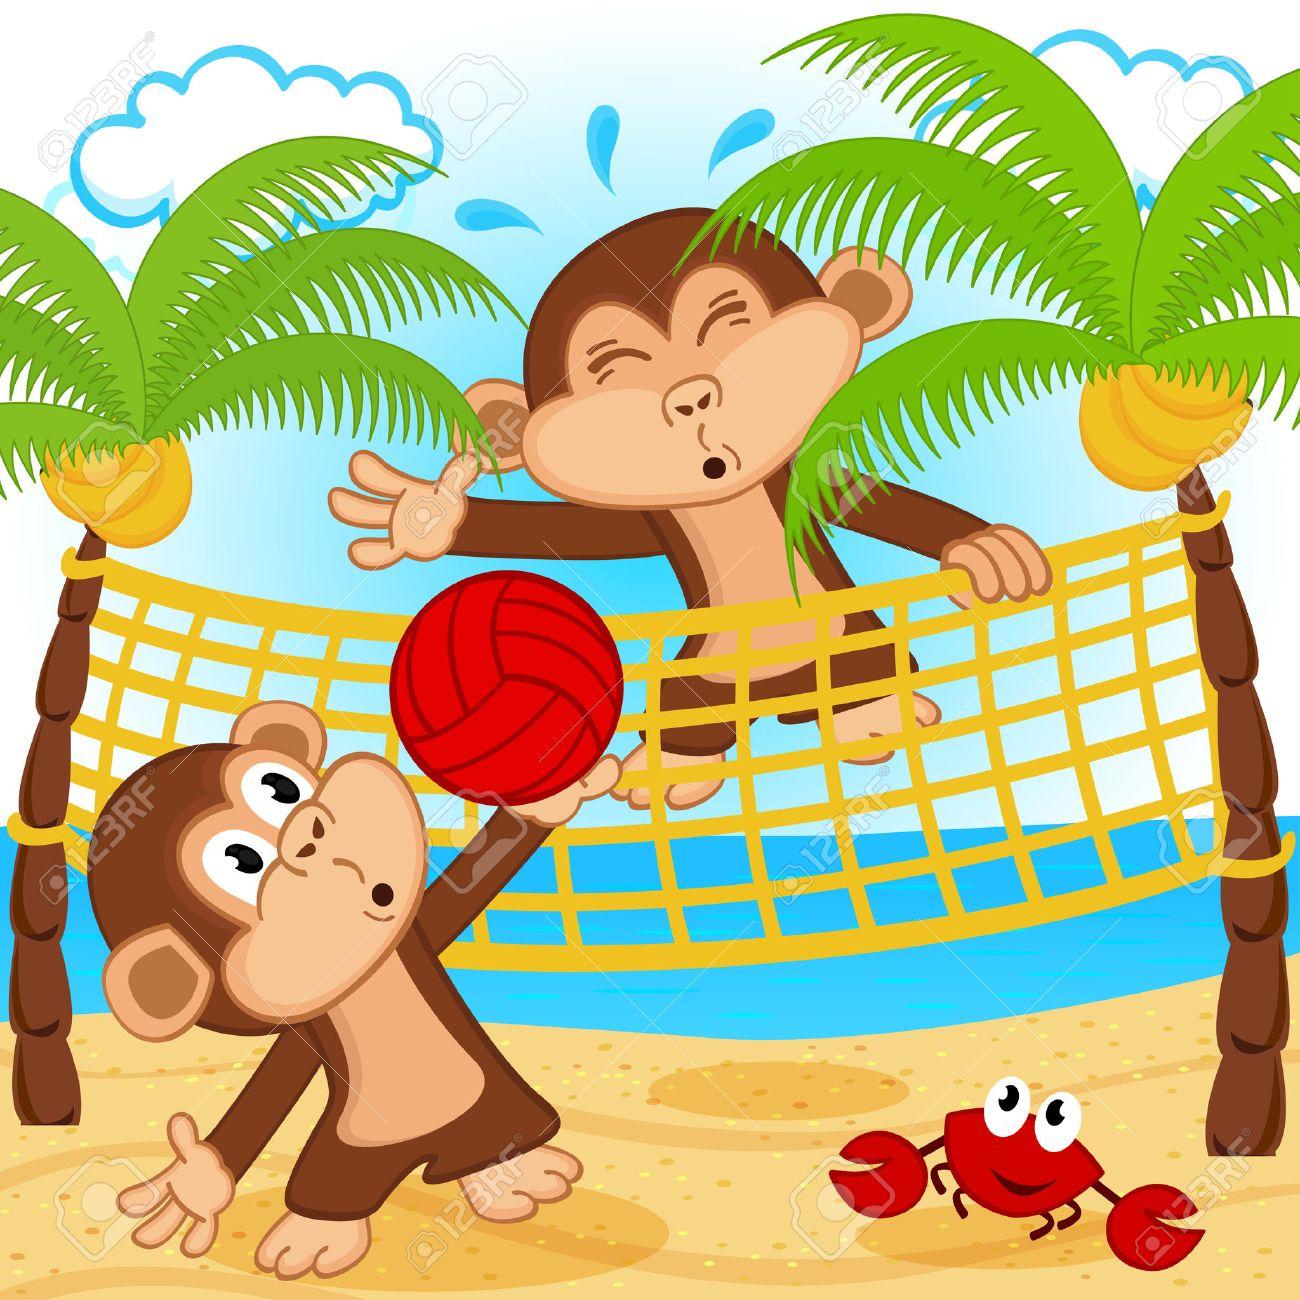 monkeys playing in beach volleyball - vector illustration Standard-Bild - 27144237